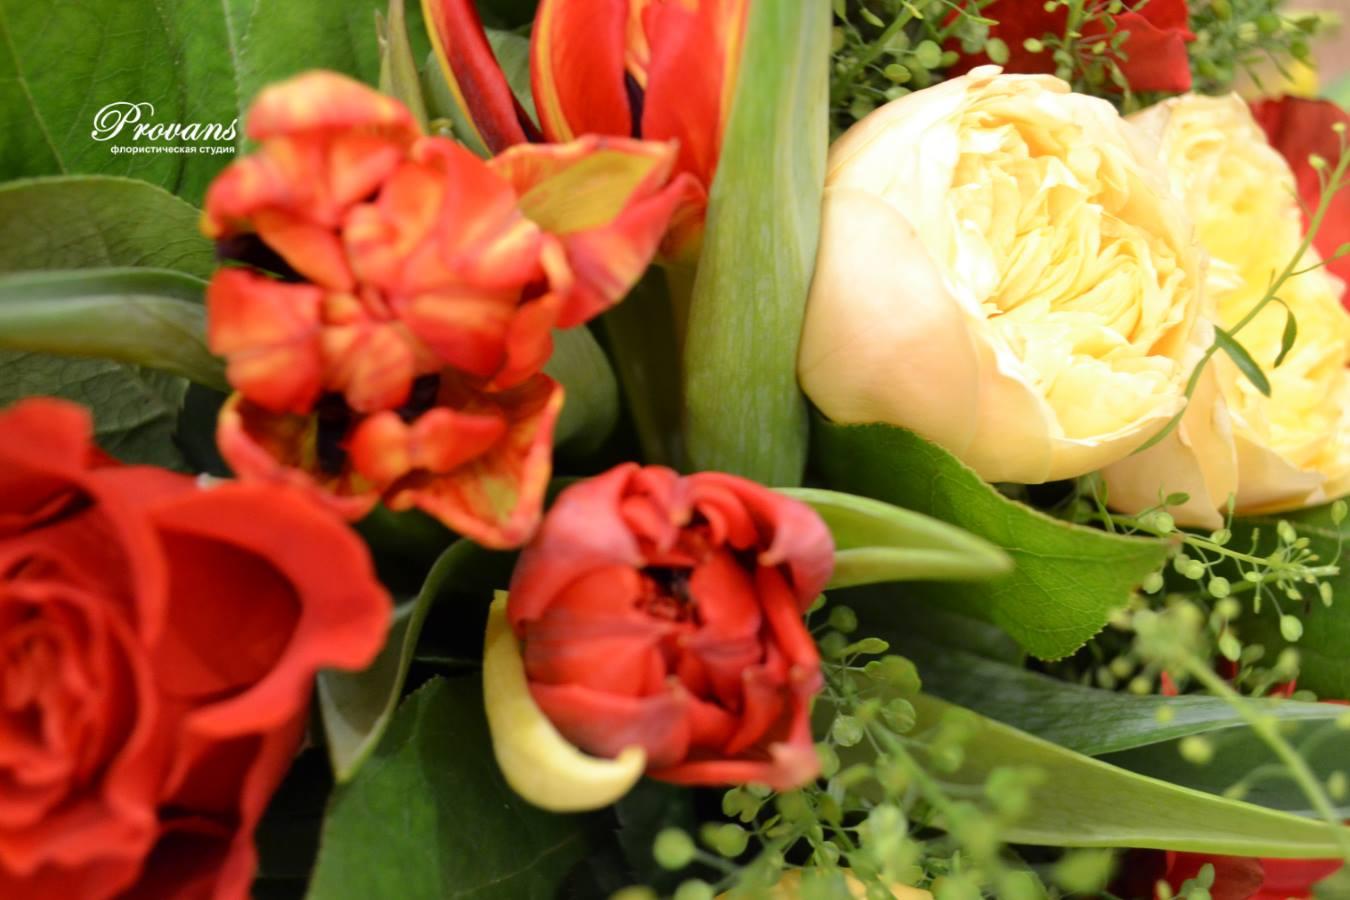 Букет Техас. Цветы: герберы, розы, тюльпаны